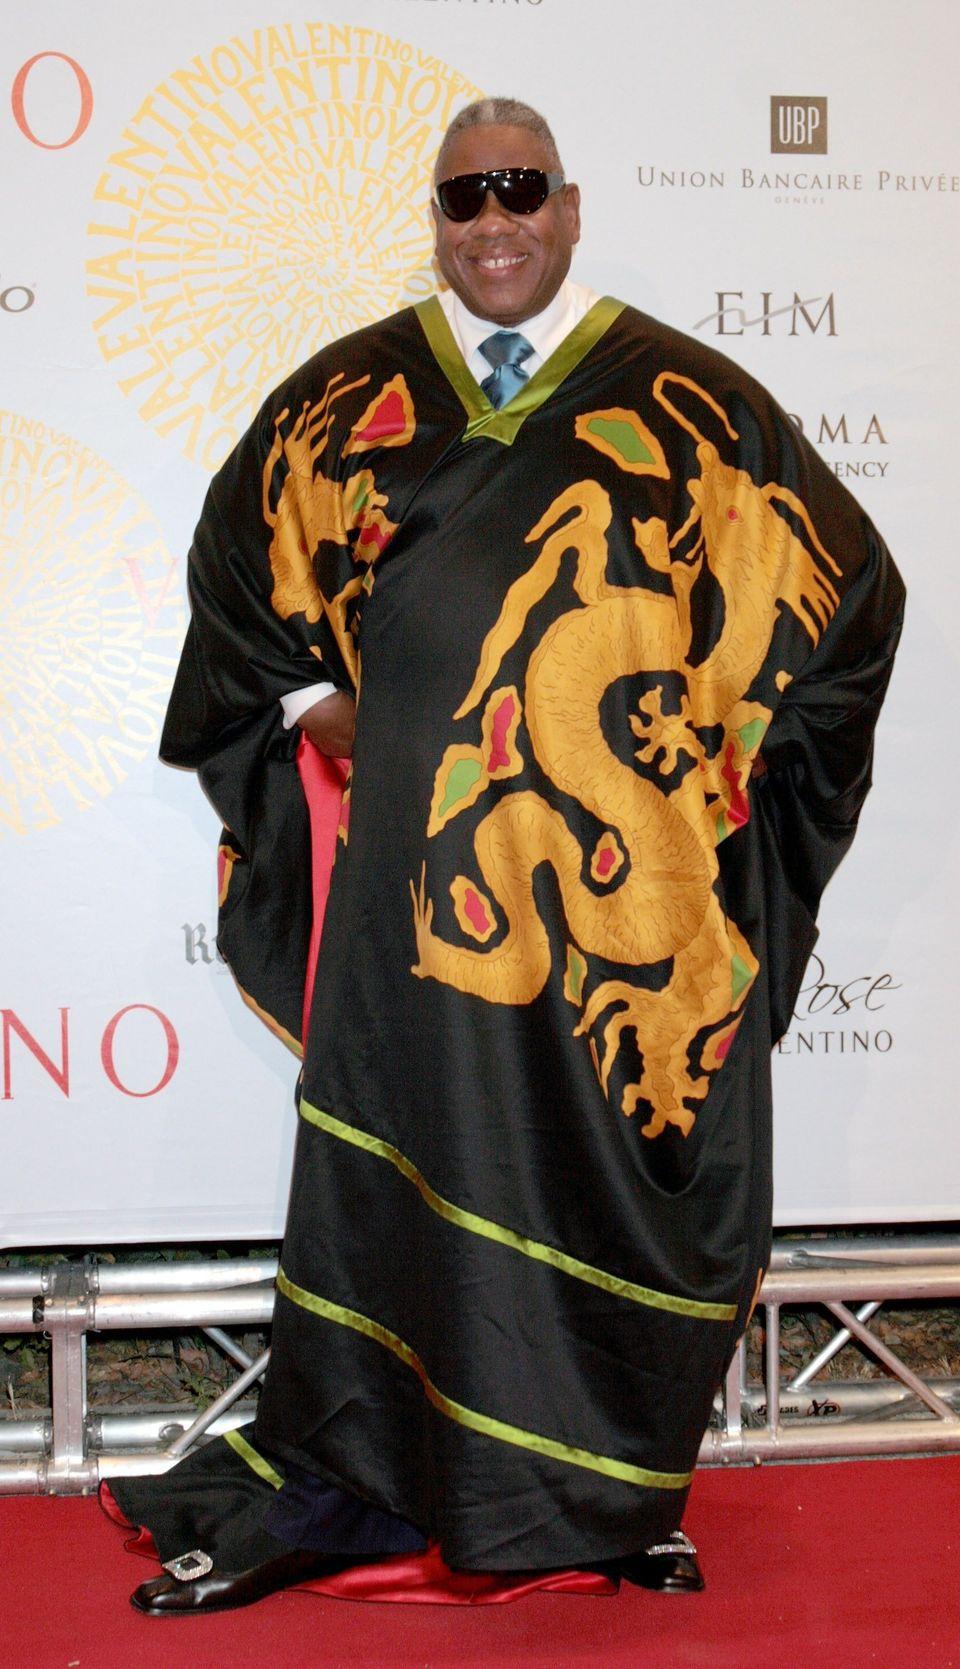 At Valentino's haute couture collection celebration in Rome.